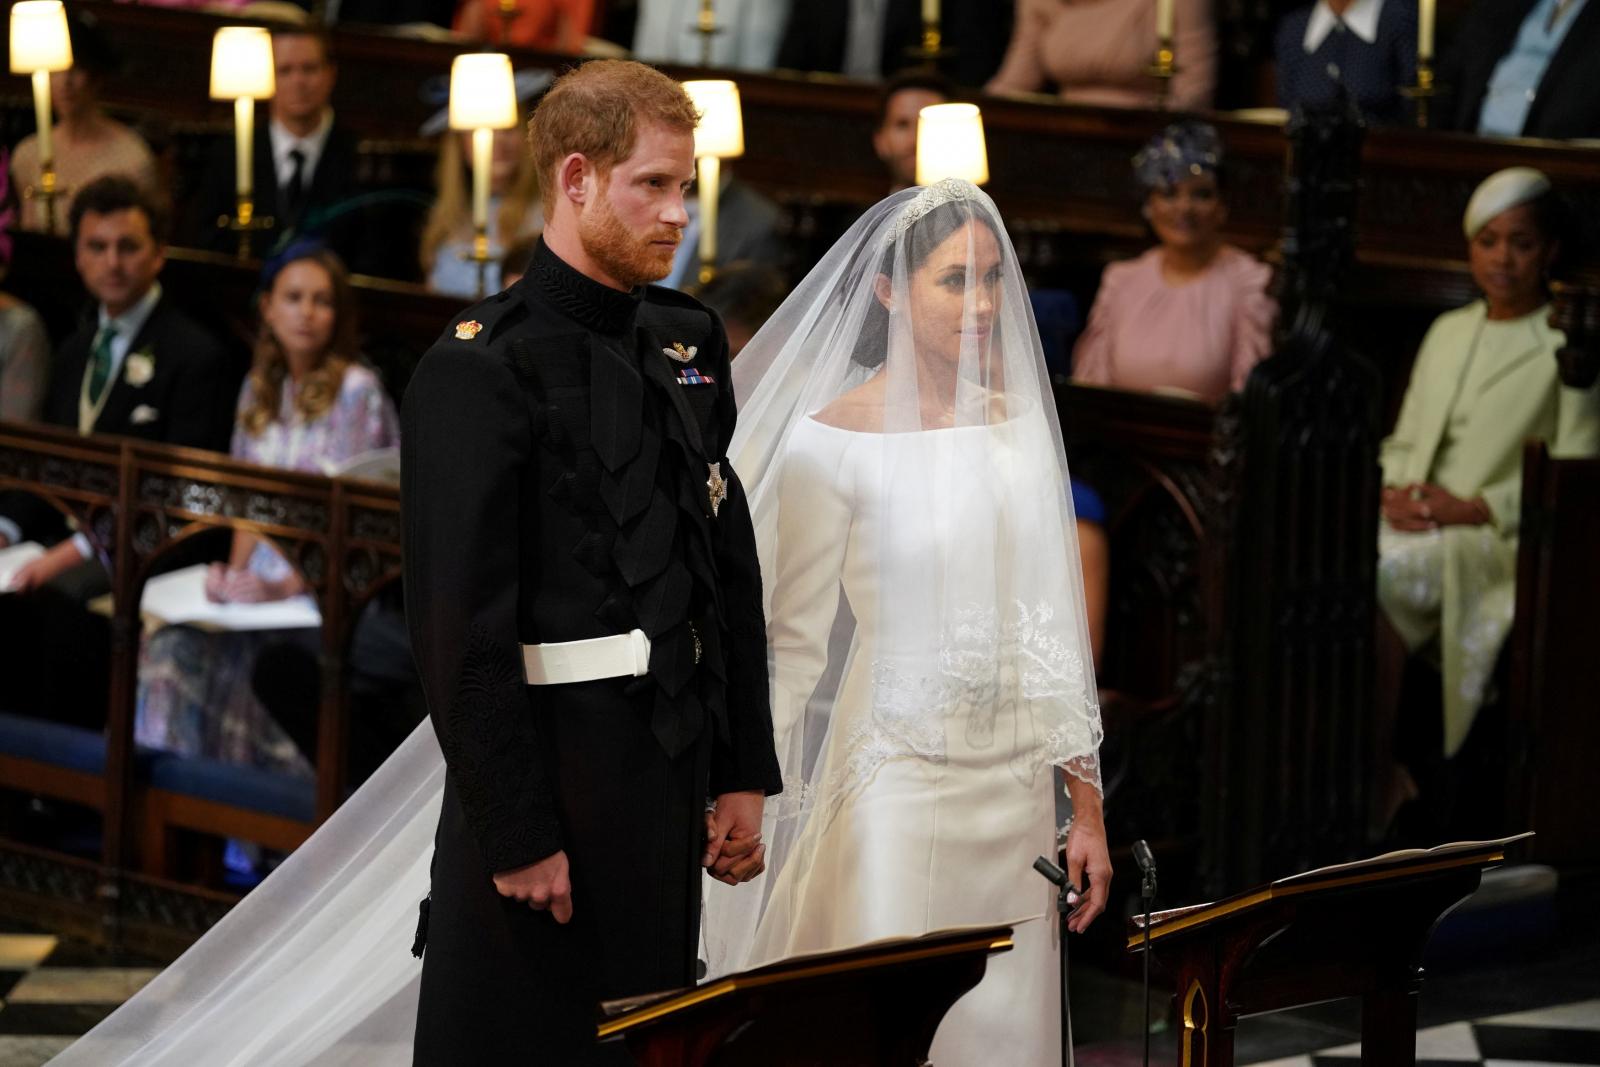 Royal wedding of Harry and Meghan